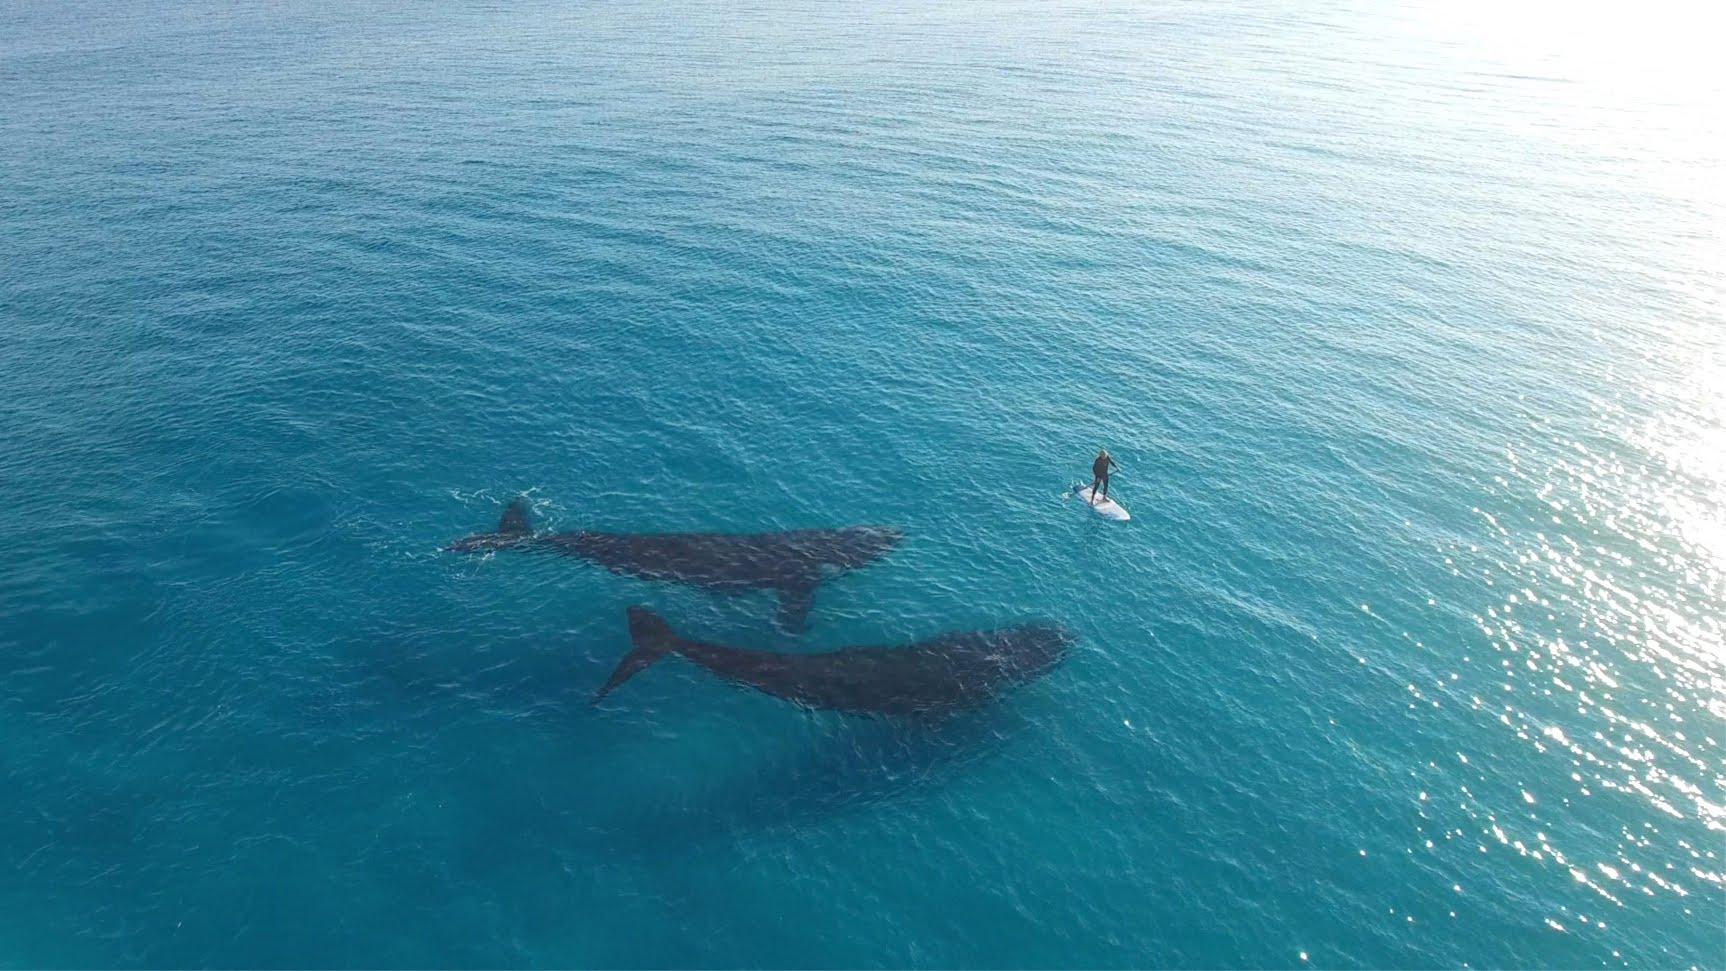 V blízkosti velryb – video, které navodí radost a pohodu